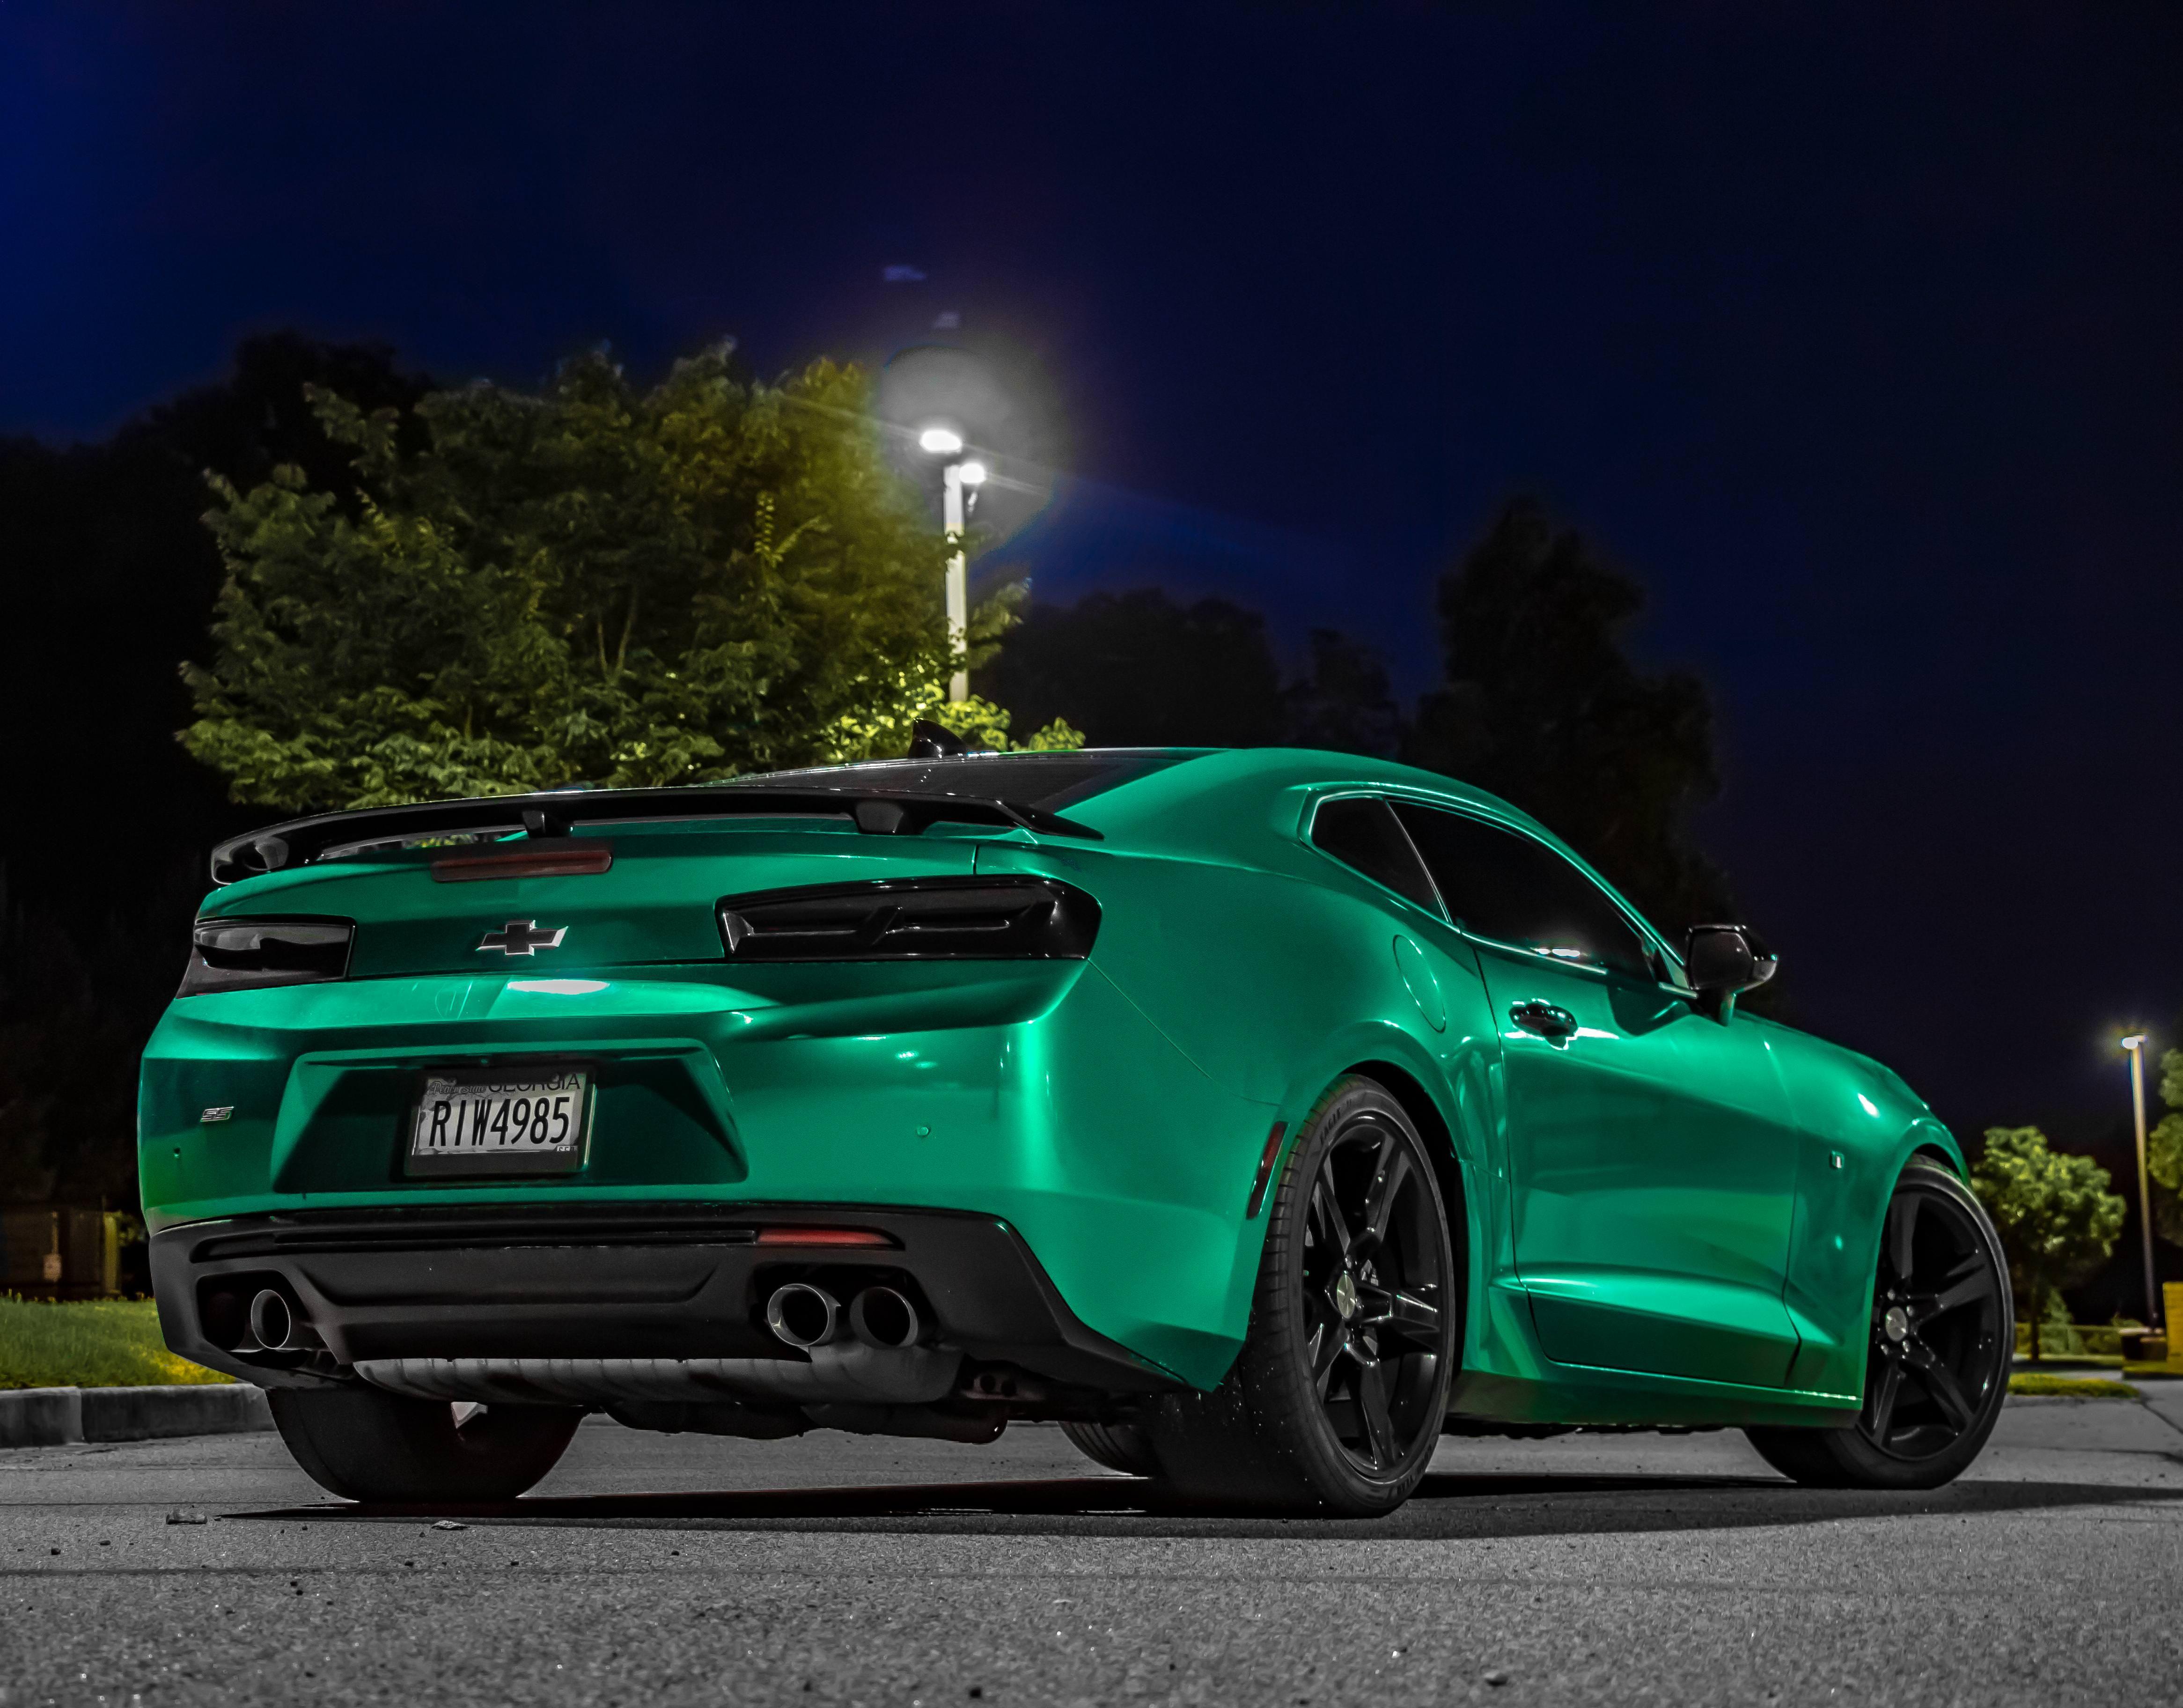 Green Aqua Wrapped Camaro At Night Camaro Camaro Car Sports Cars Luxury